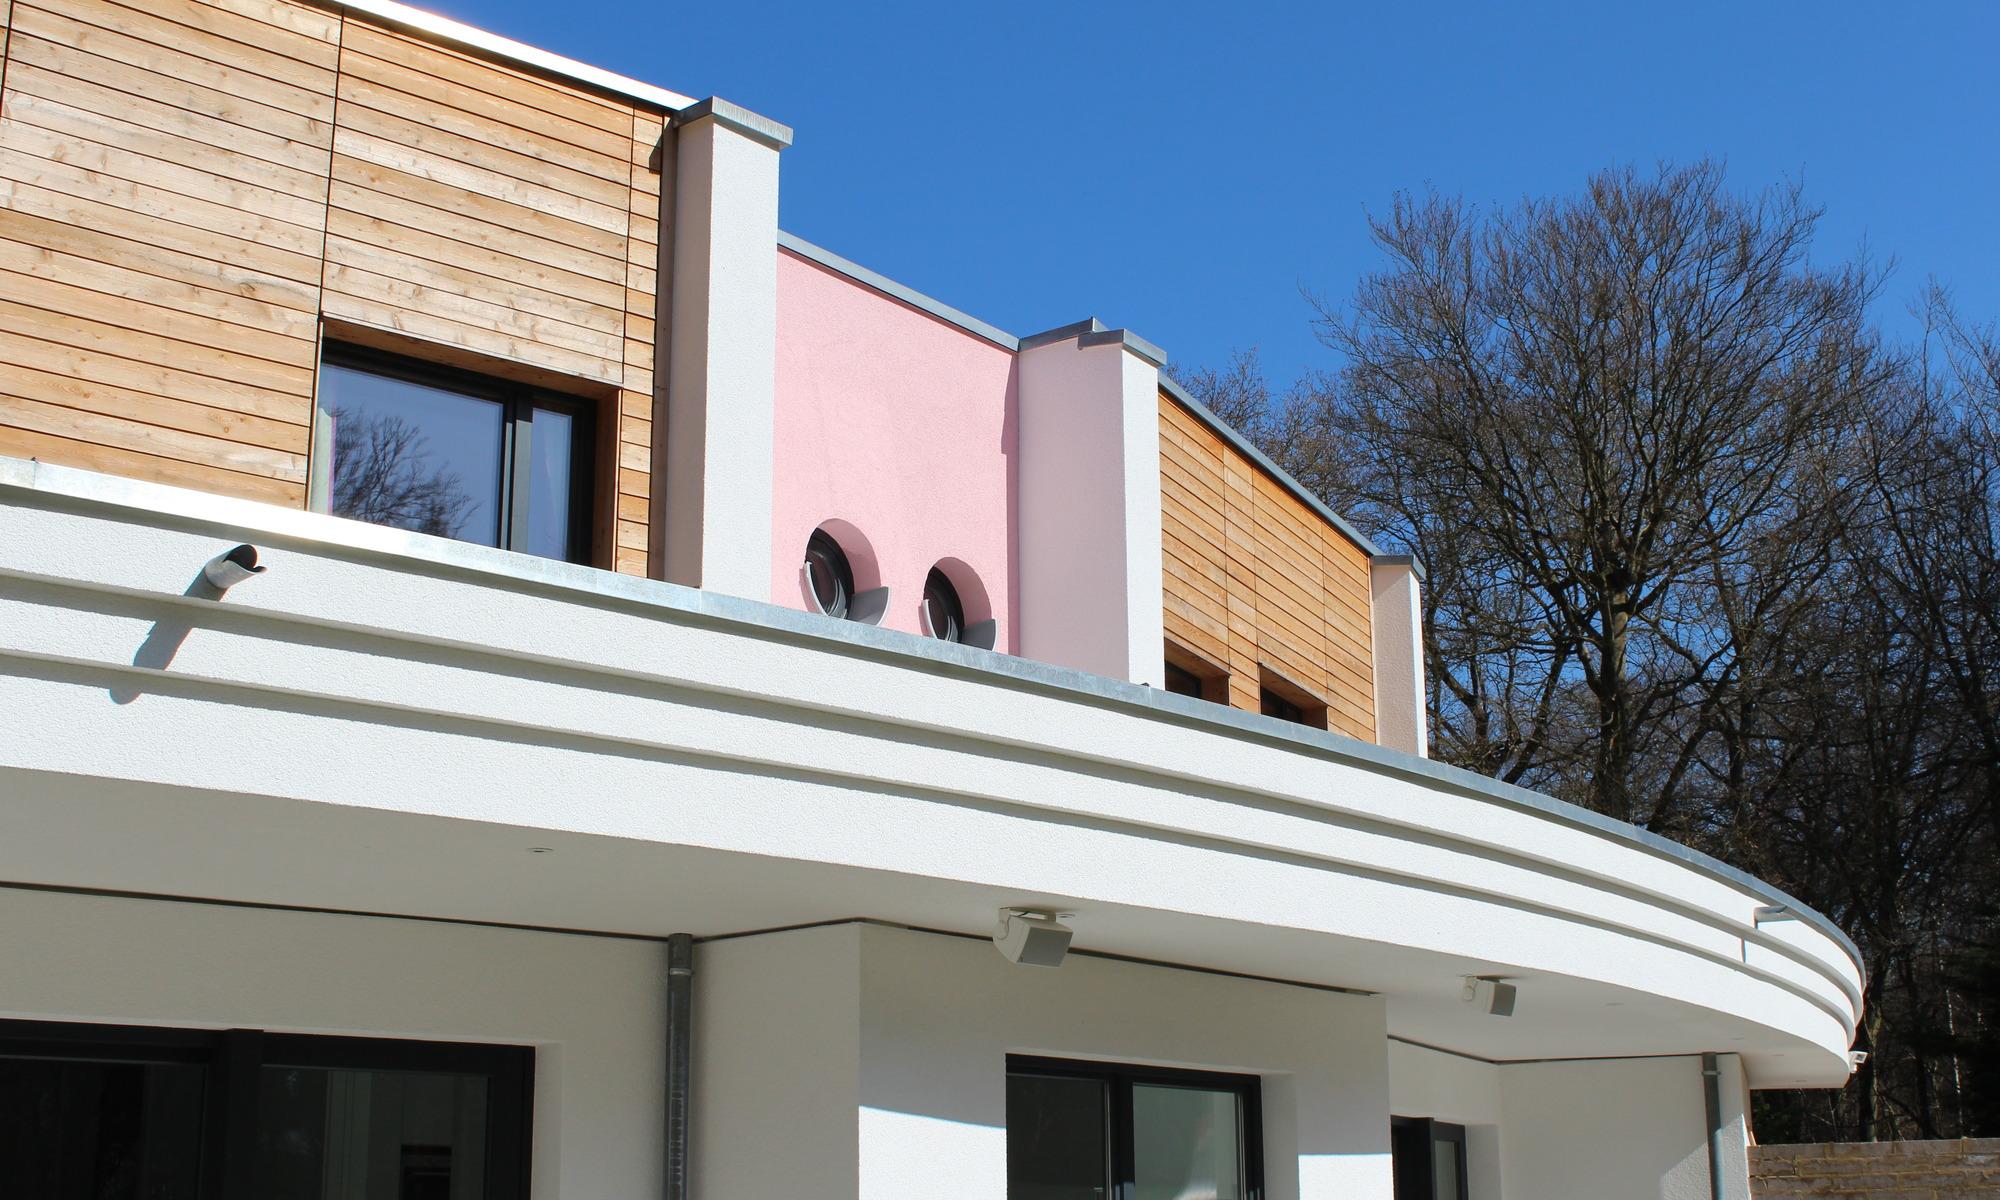 Contemporary eco-friendly home with bespoke design